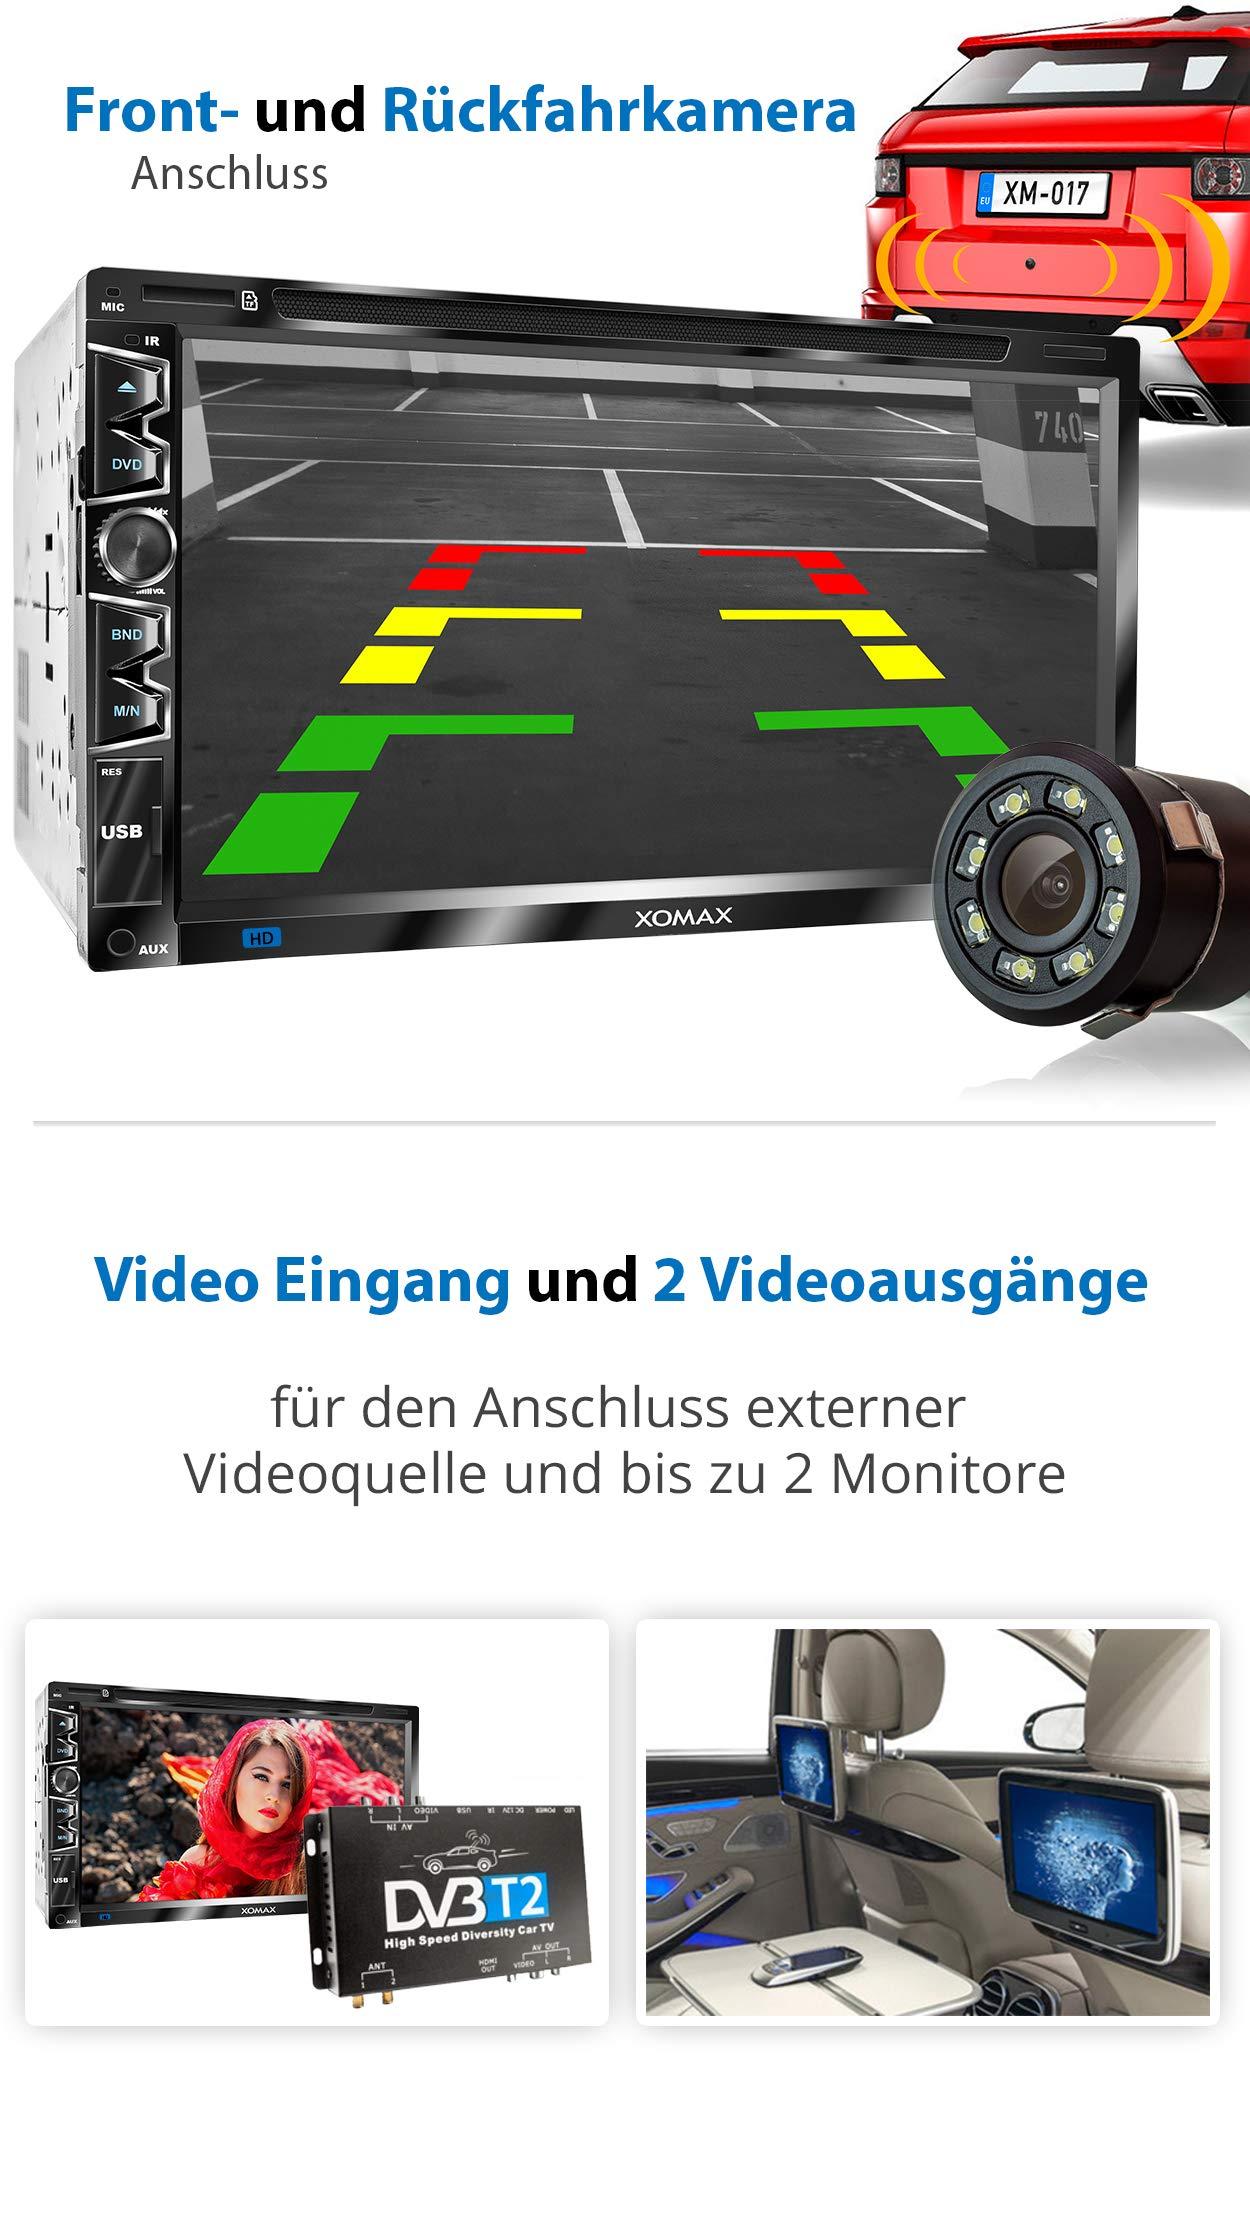 XOMAX-XM-2D6907-Autoradio-mit-kapazitivem-69-175-cm-Touchscreen-Bildschirm-I-DVD-CD-USB-SD-AUX-I-Bluetooth-Freisprecheinrichtung-I-2-DIN